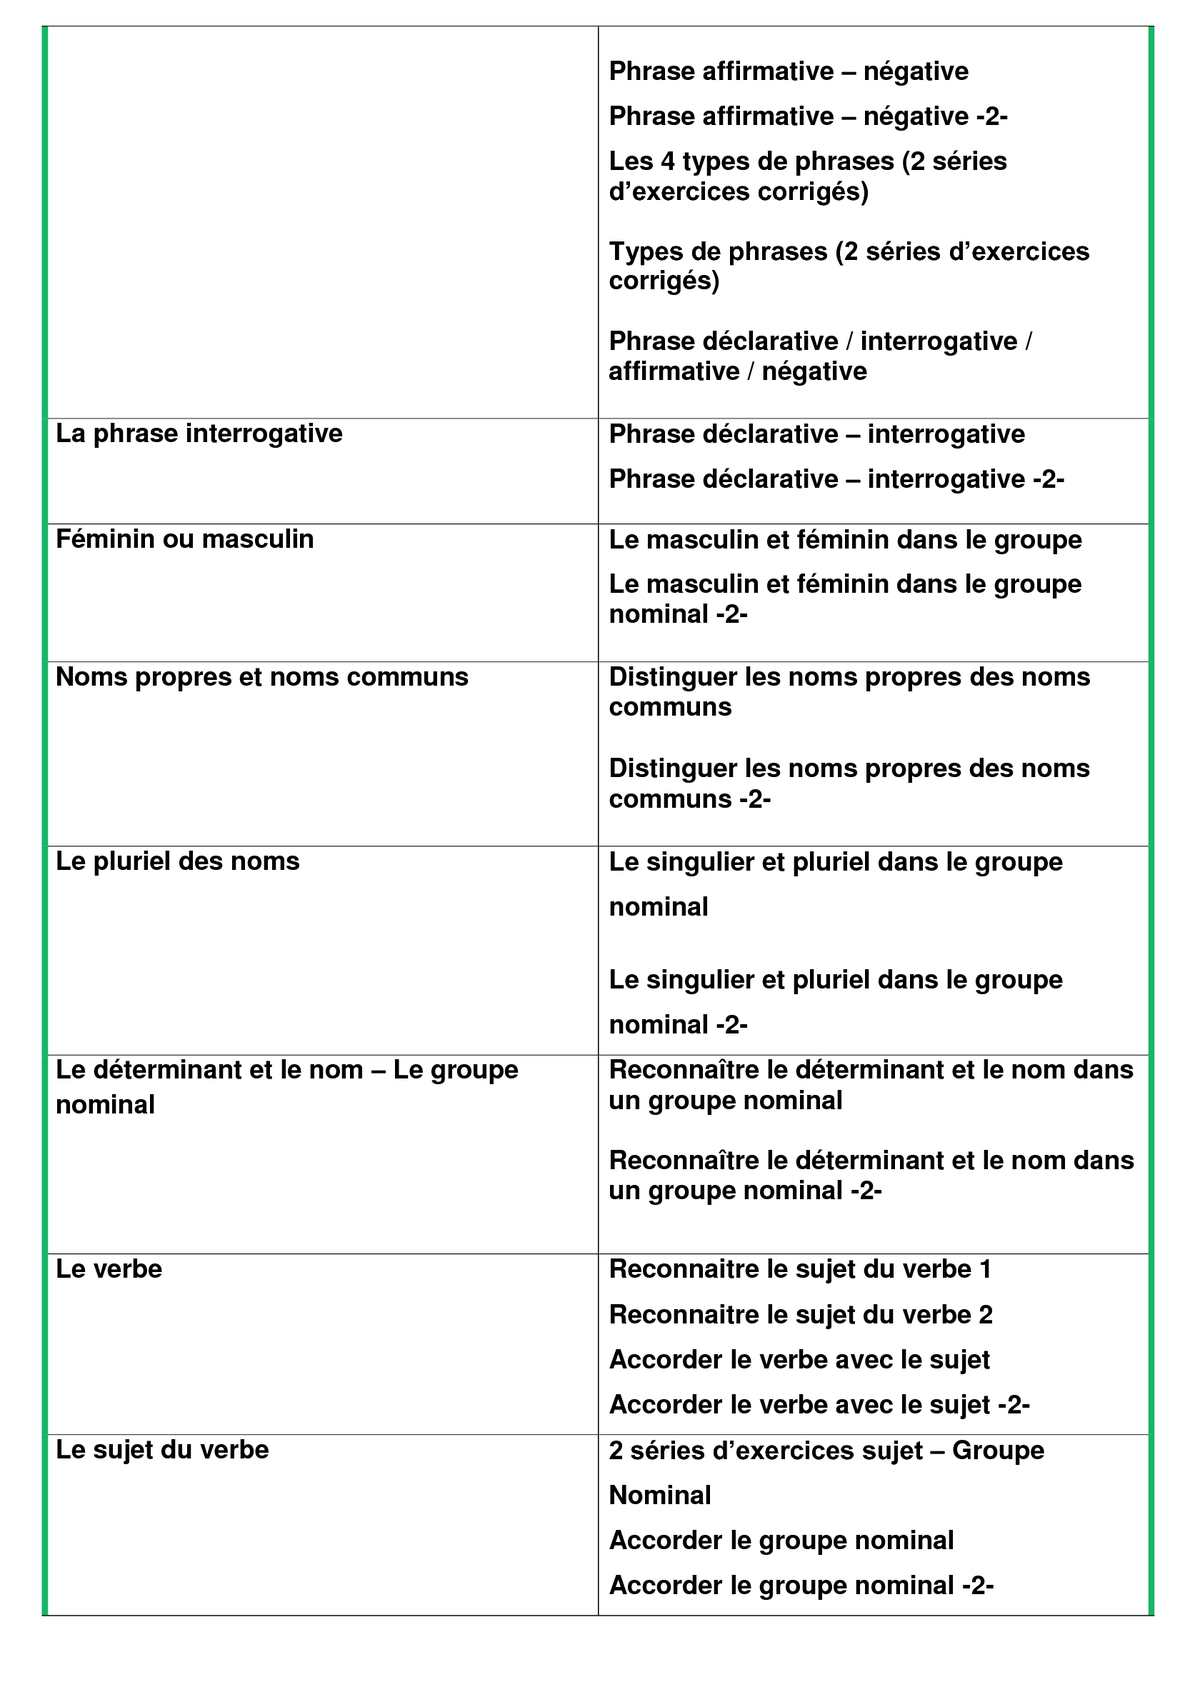 Ce1 Francais Banque De Lecons Et Exercices Calameo Downloader